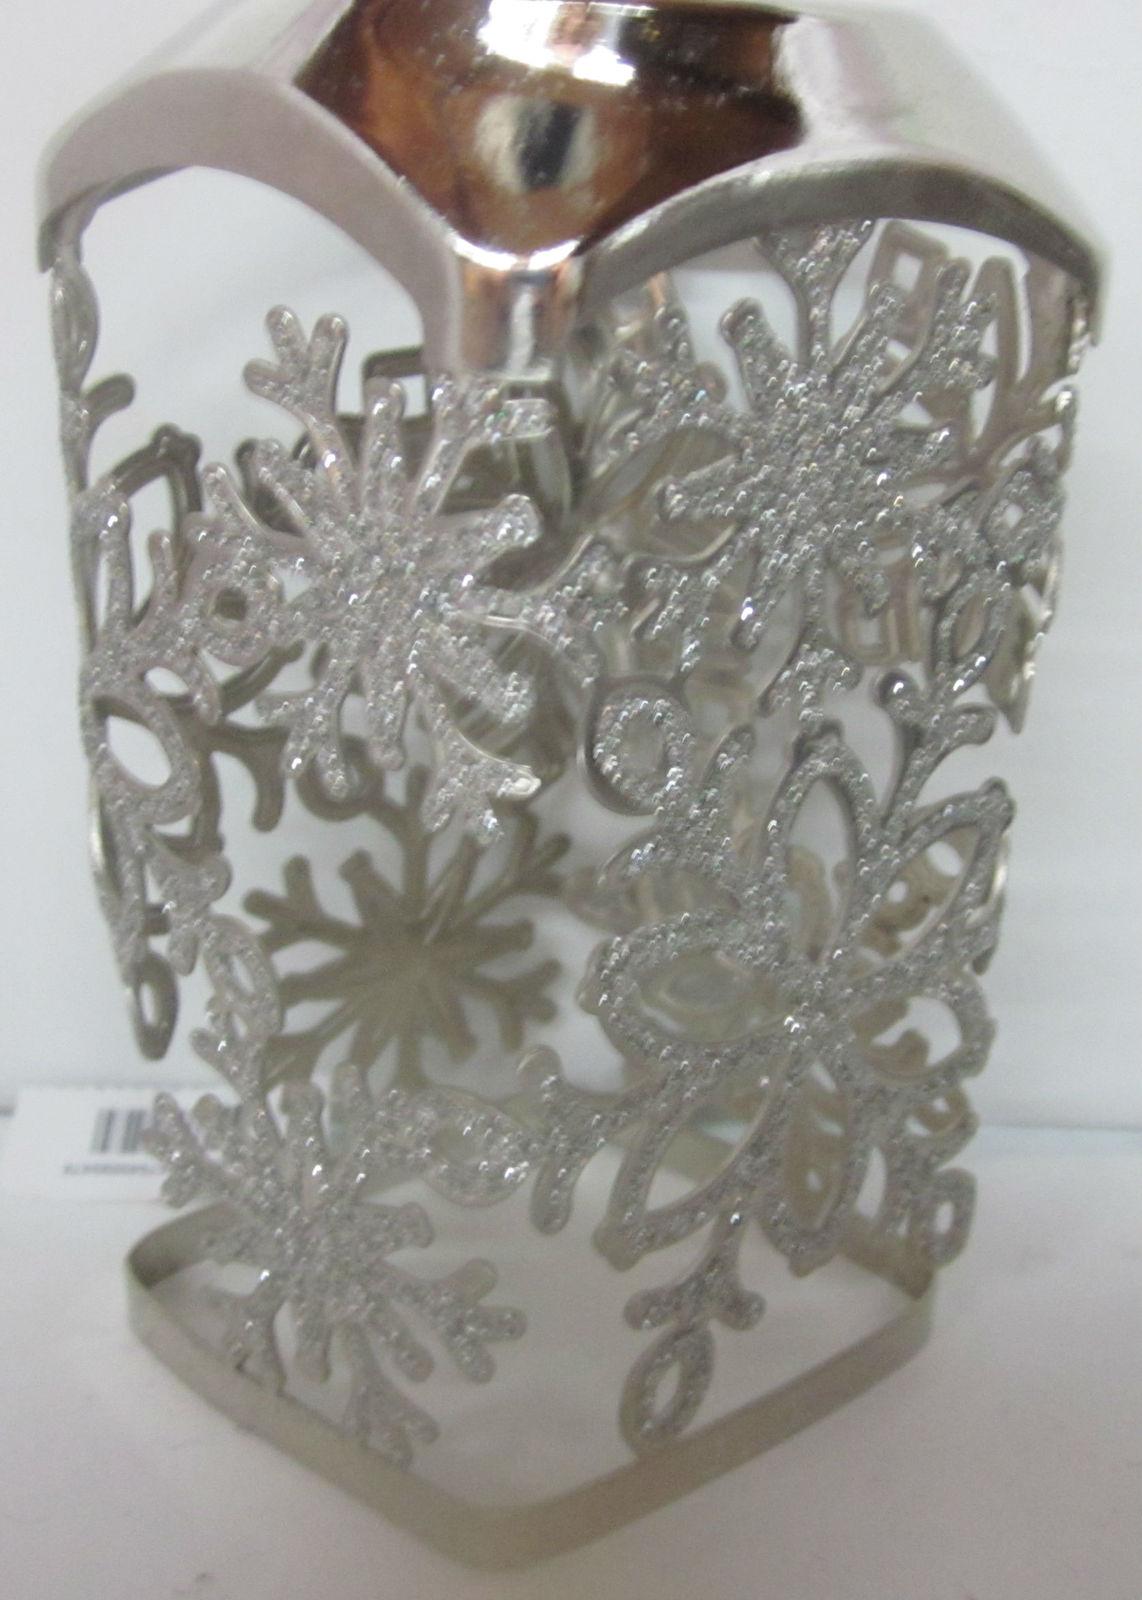 Bath & Body Works Gentle Foaming Hand Soap Sleeve Holder Glitter Snowflakes image 2